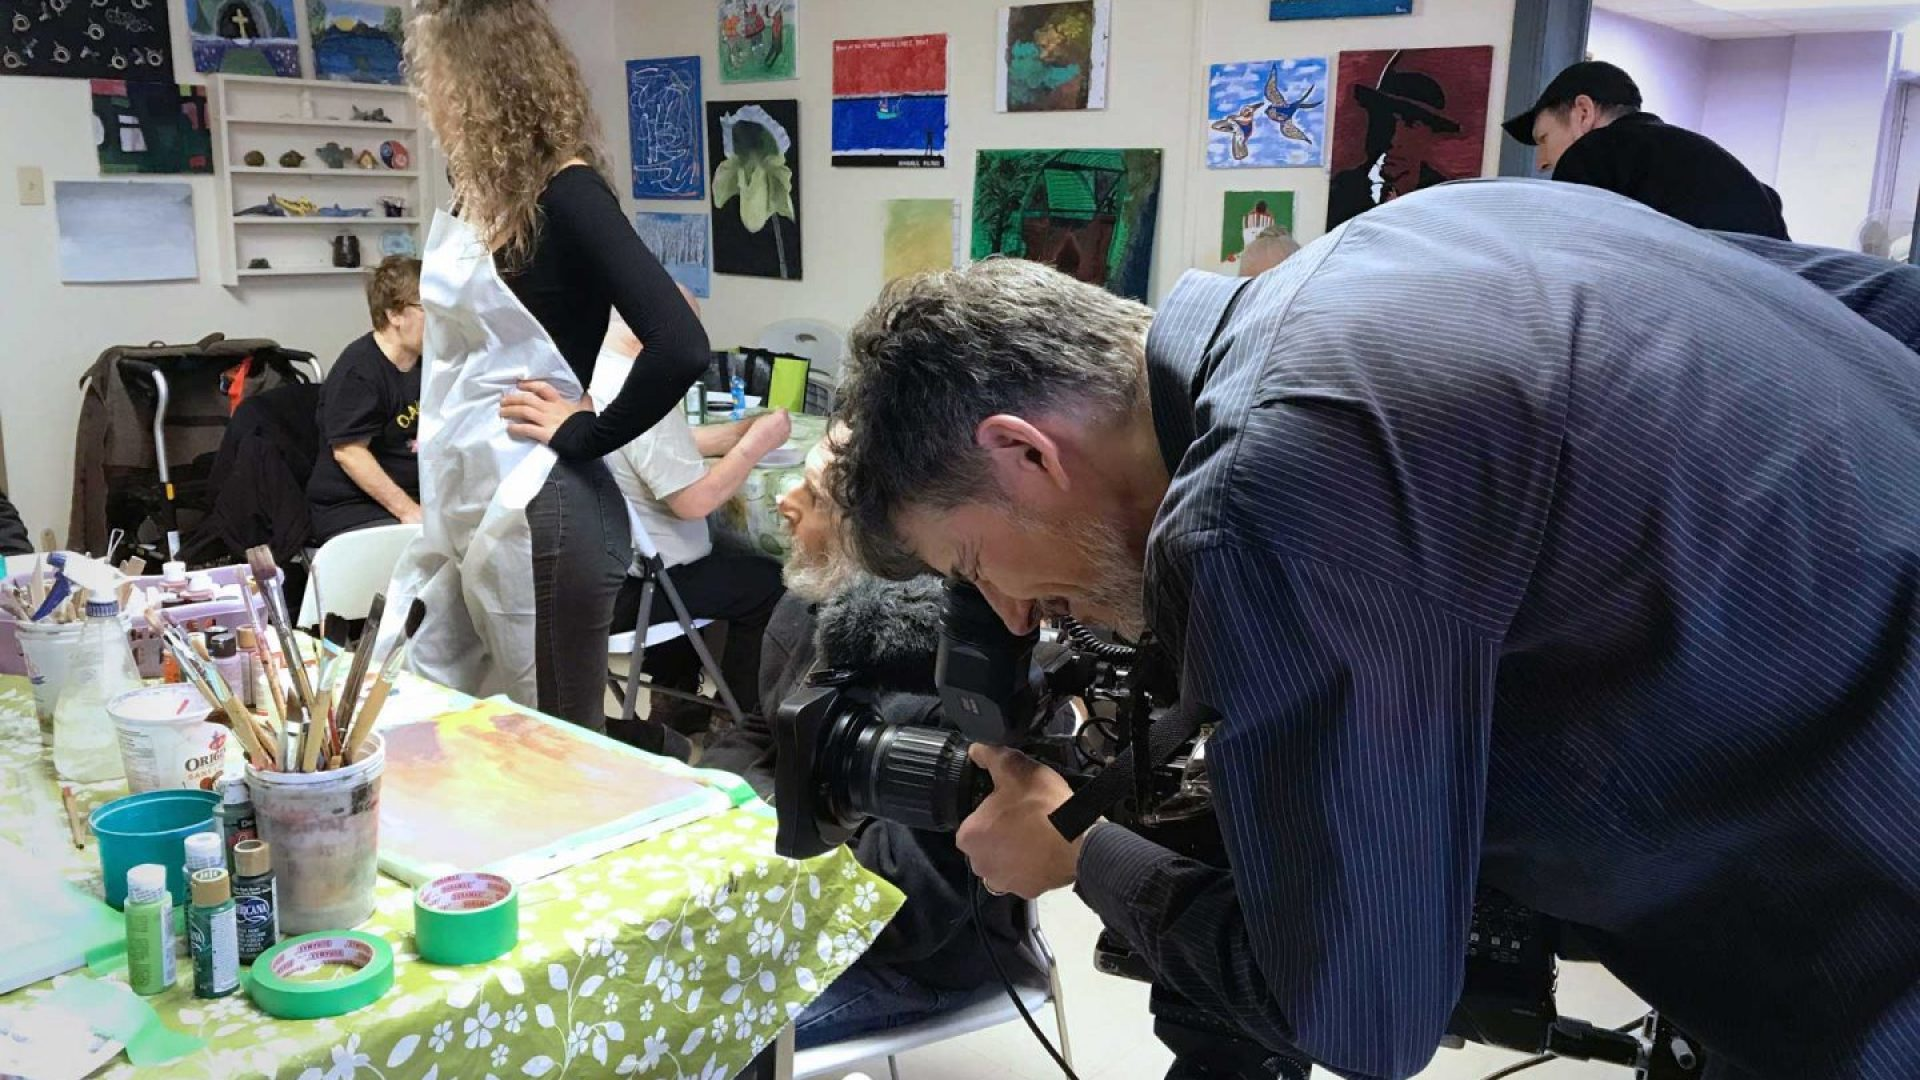 CBC OUR TORONTO Marivel visiting 220 Oak Street art studio to film segment